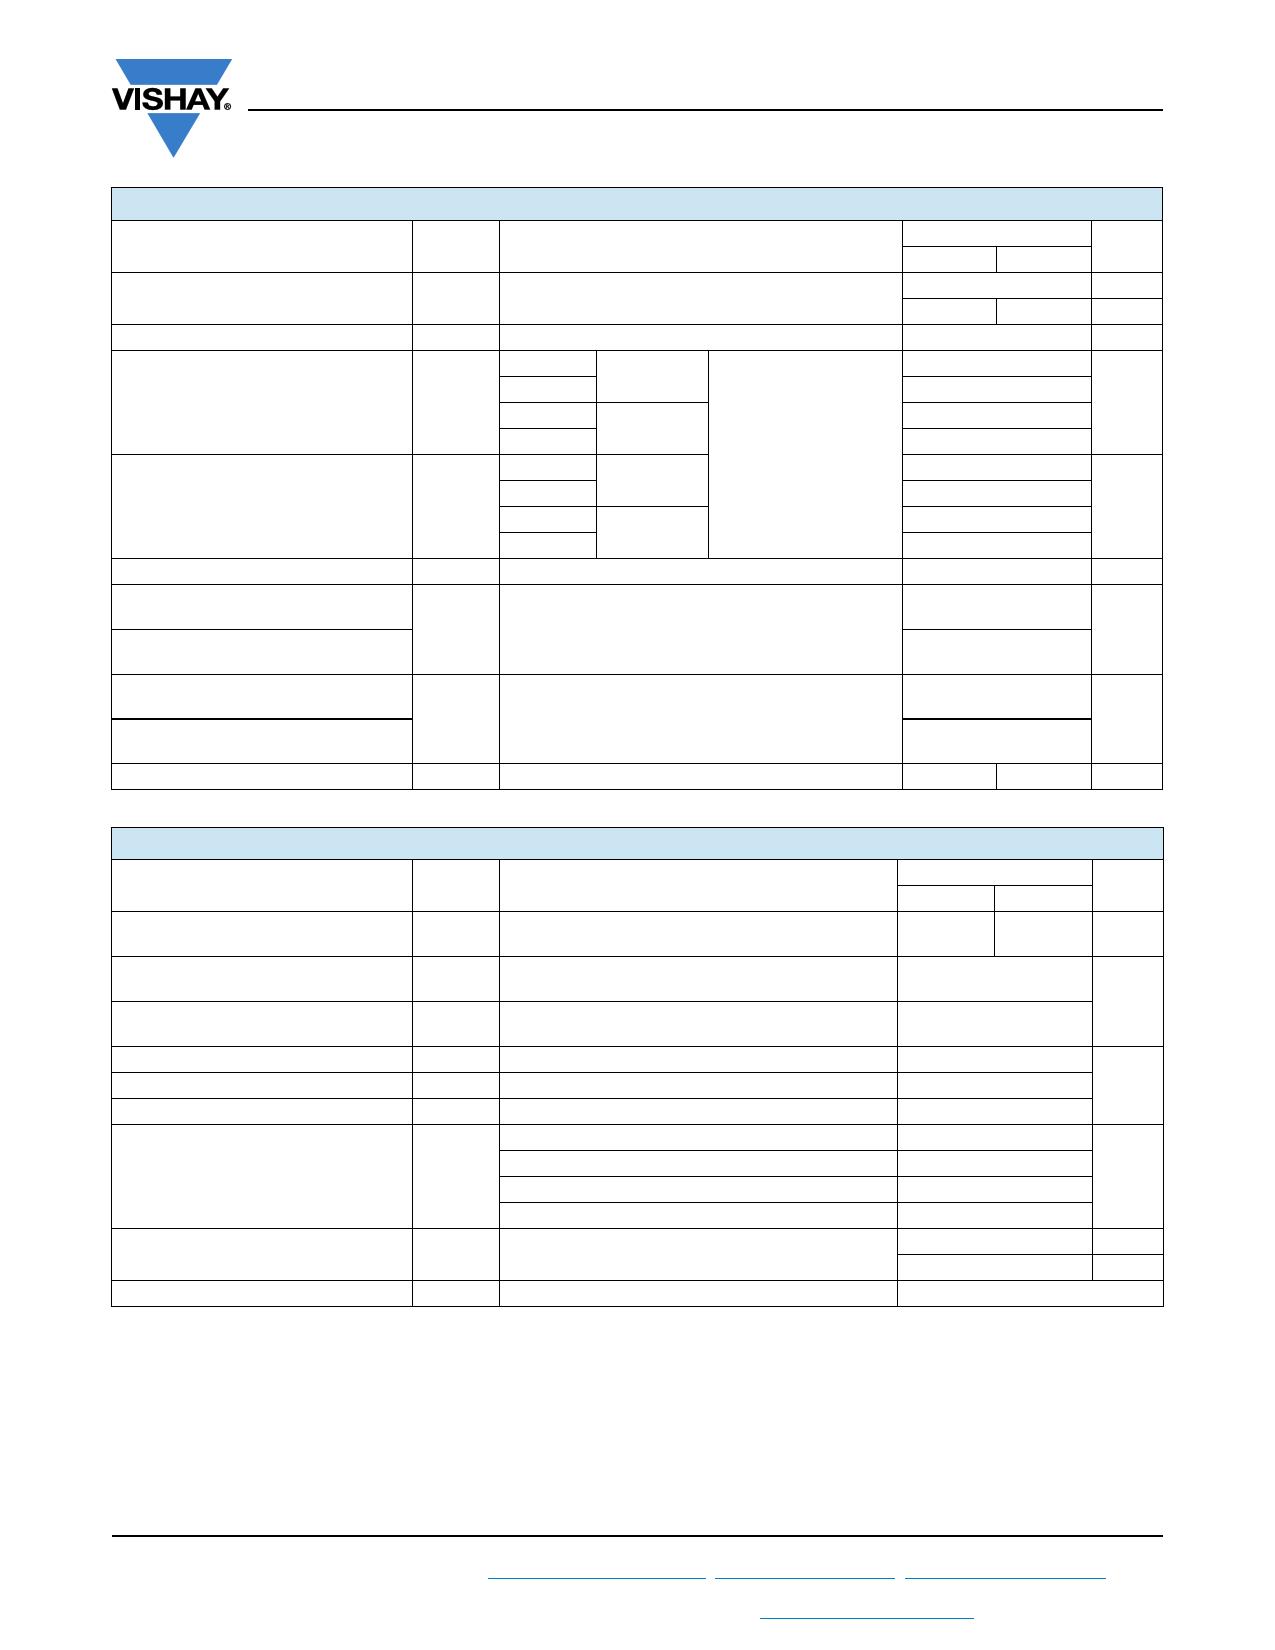 VS-88HF80 pdf, equivalent, schematic